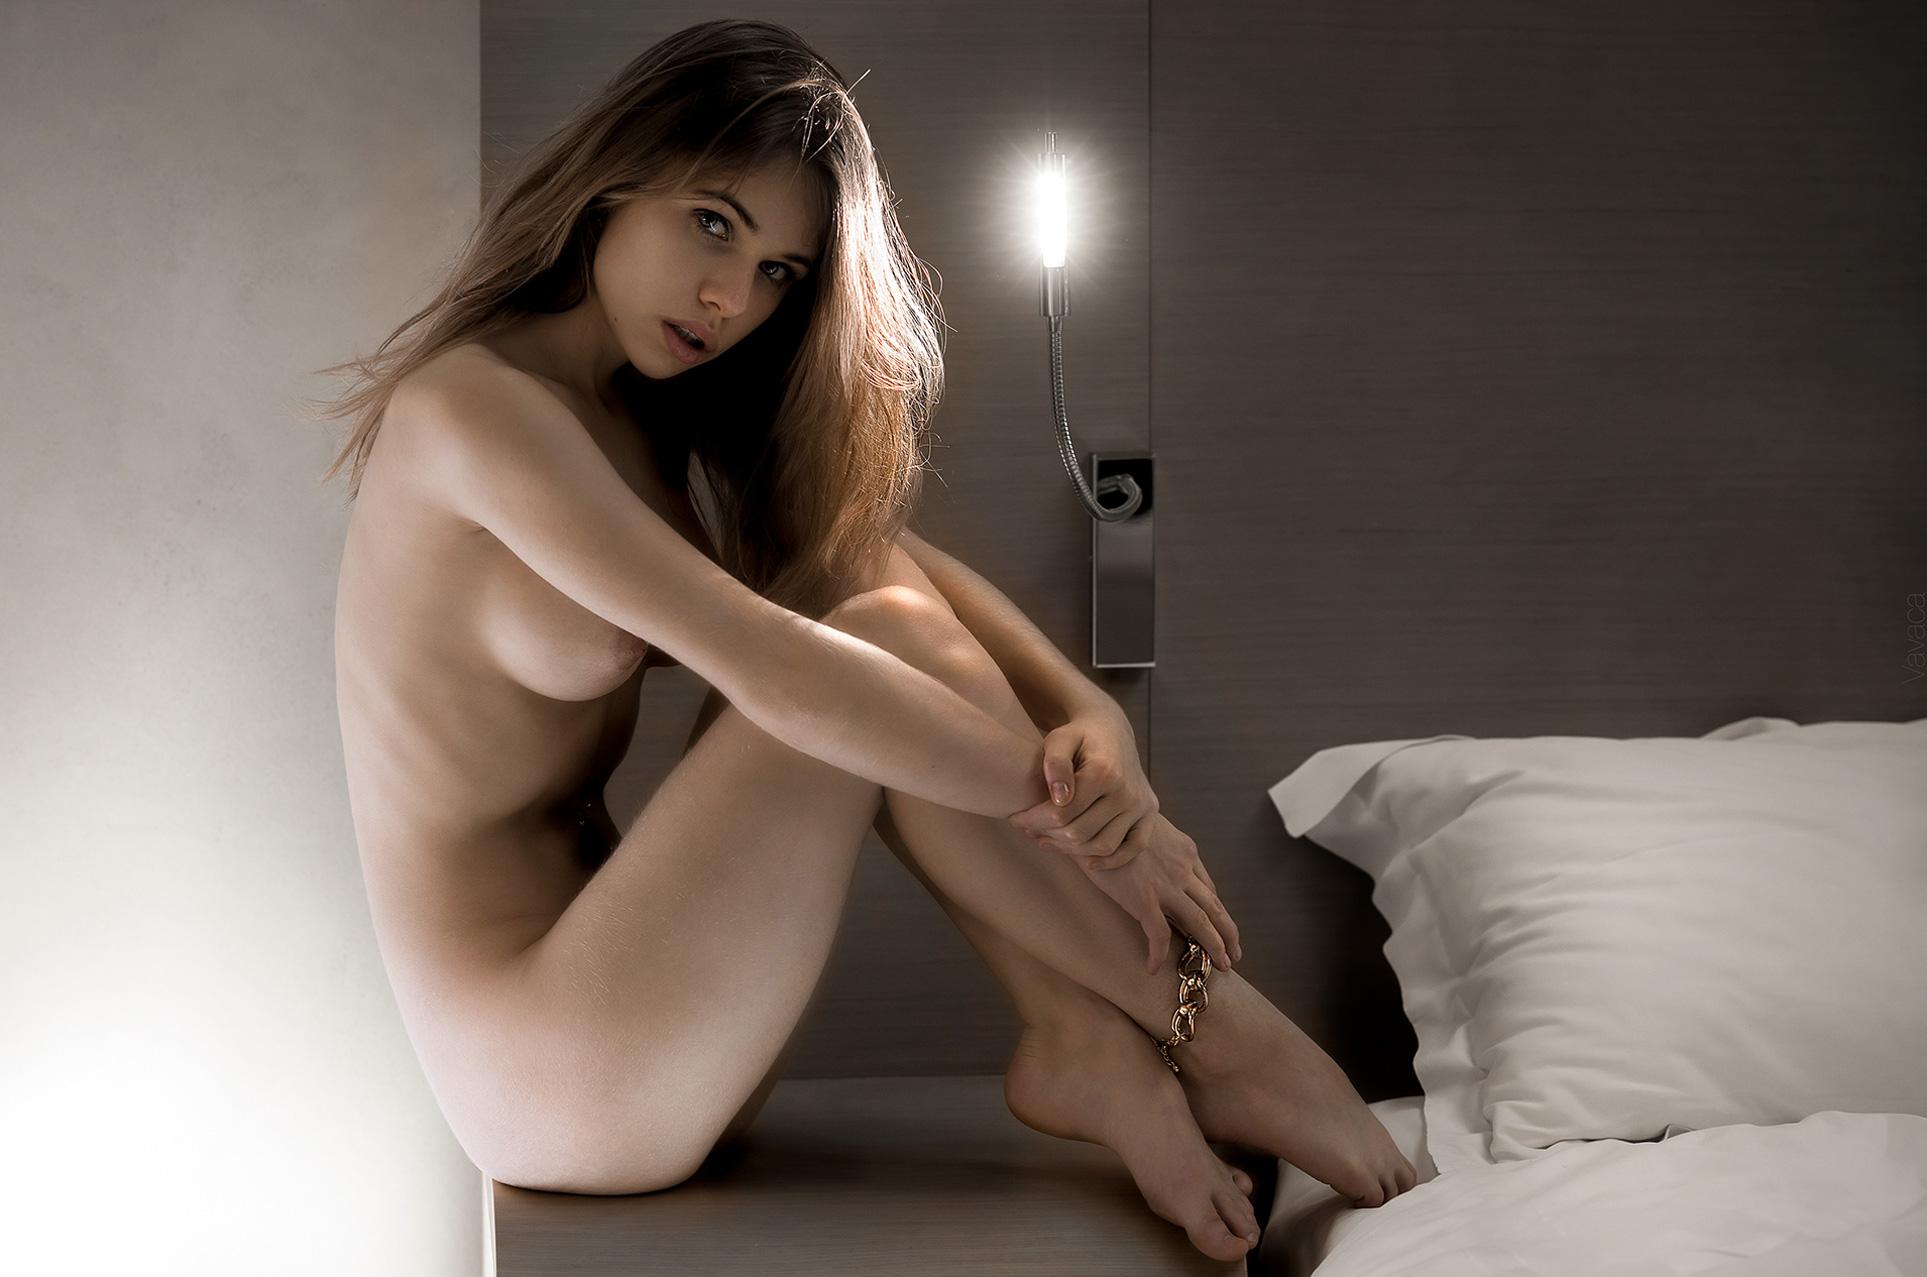 Александра Смелова / Alexandra Smelova nude by Vladimir Nikolaev / Lounge